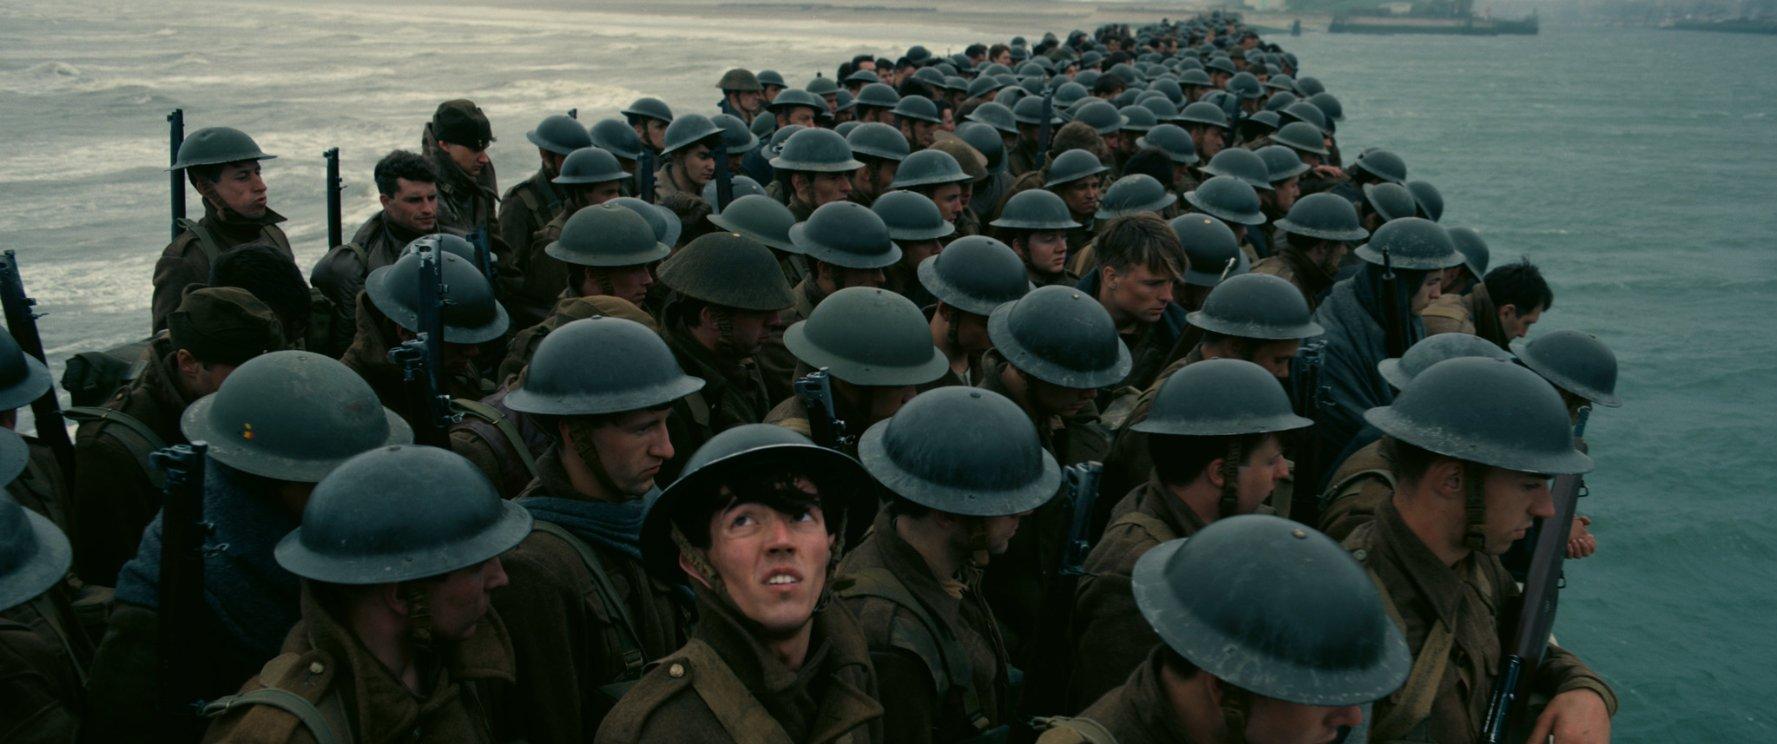 Warner Bros. Picture - © 2016 Warner Bros. Entertainment Inc., Village Roadshow Films North America Inc. and RatPac-Dune Entertainment LLC